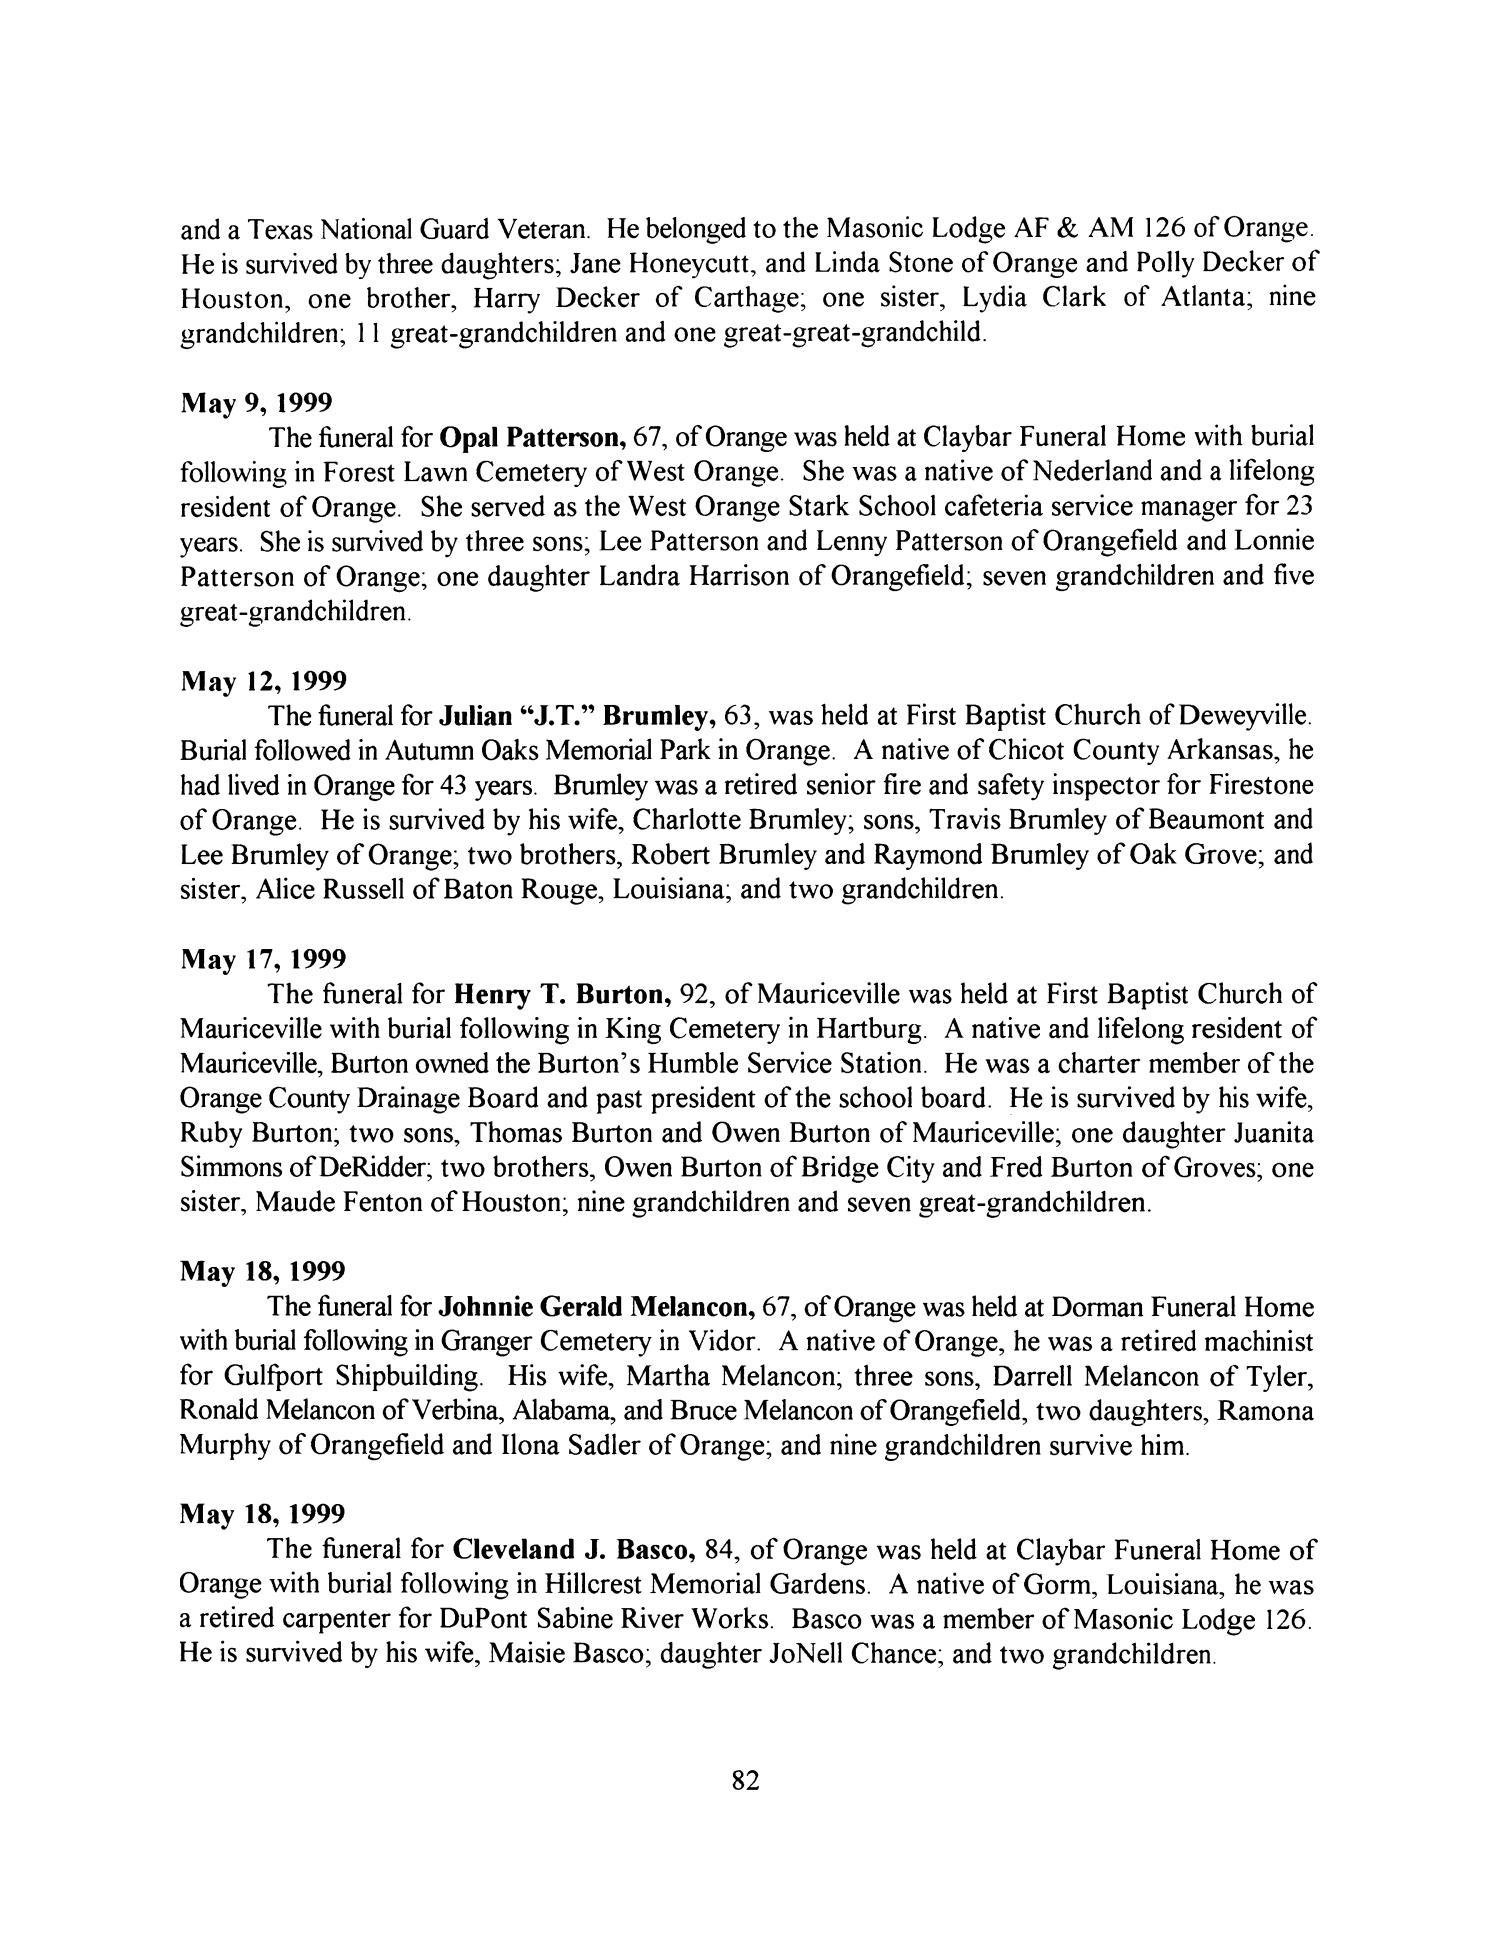 Las Sabinas Volume Number 3 Page The Portal to